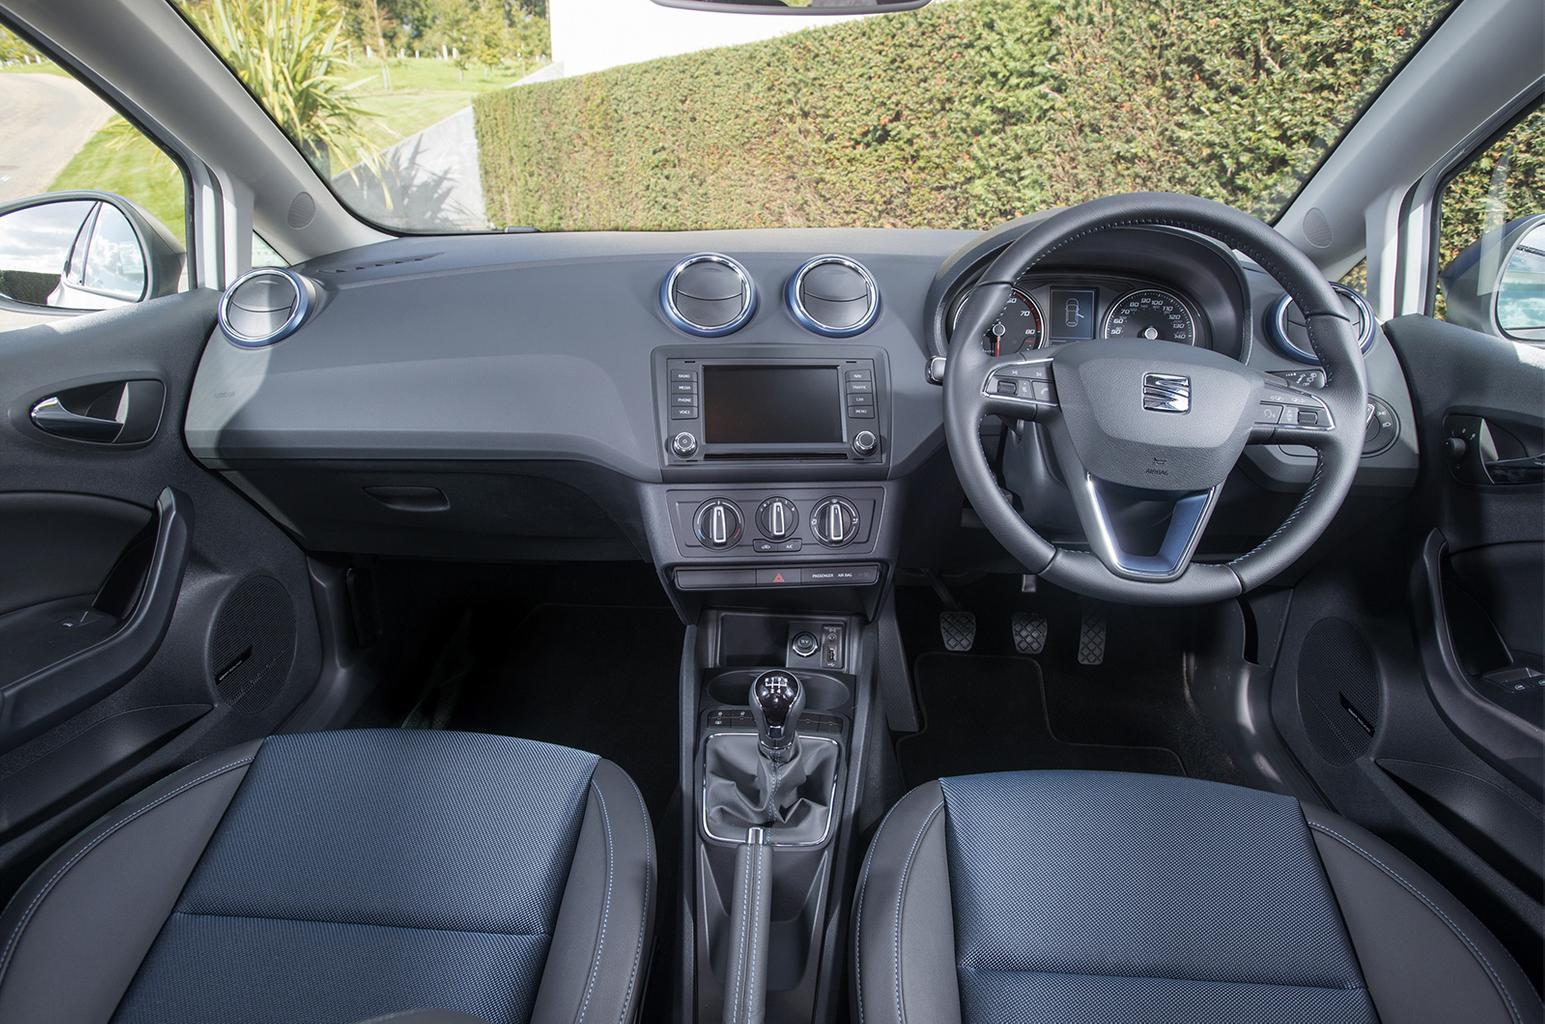 Used car of the week - Seat Ibiza